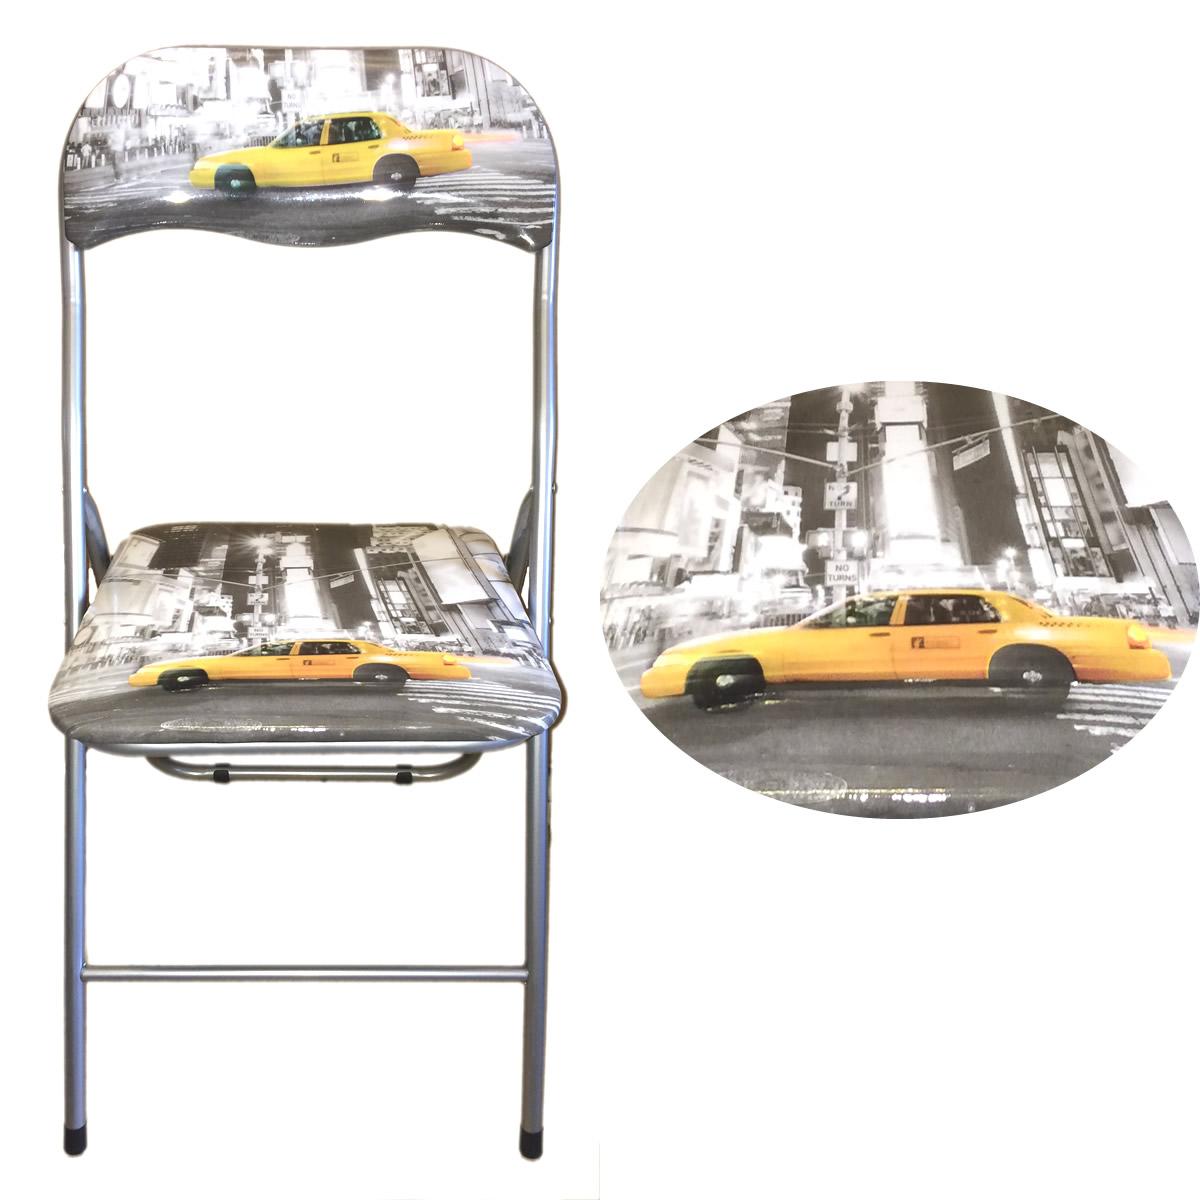 Design klappstuhl besucherstuhl faltstuhl beistellstuhl for Besucherstuhl design